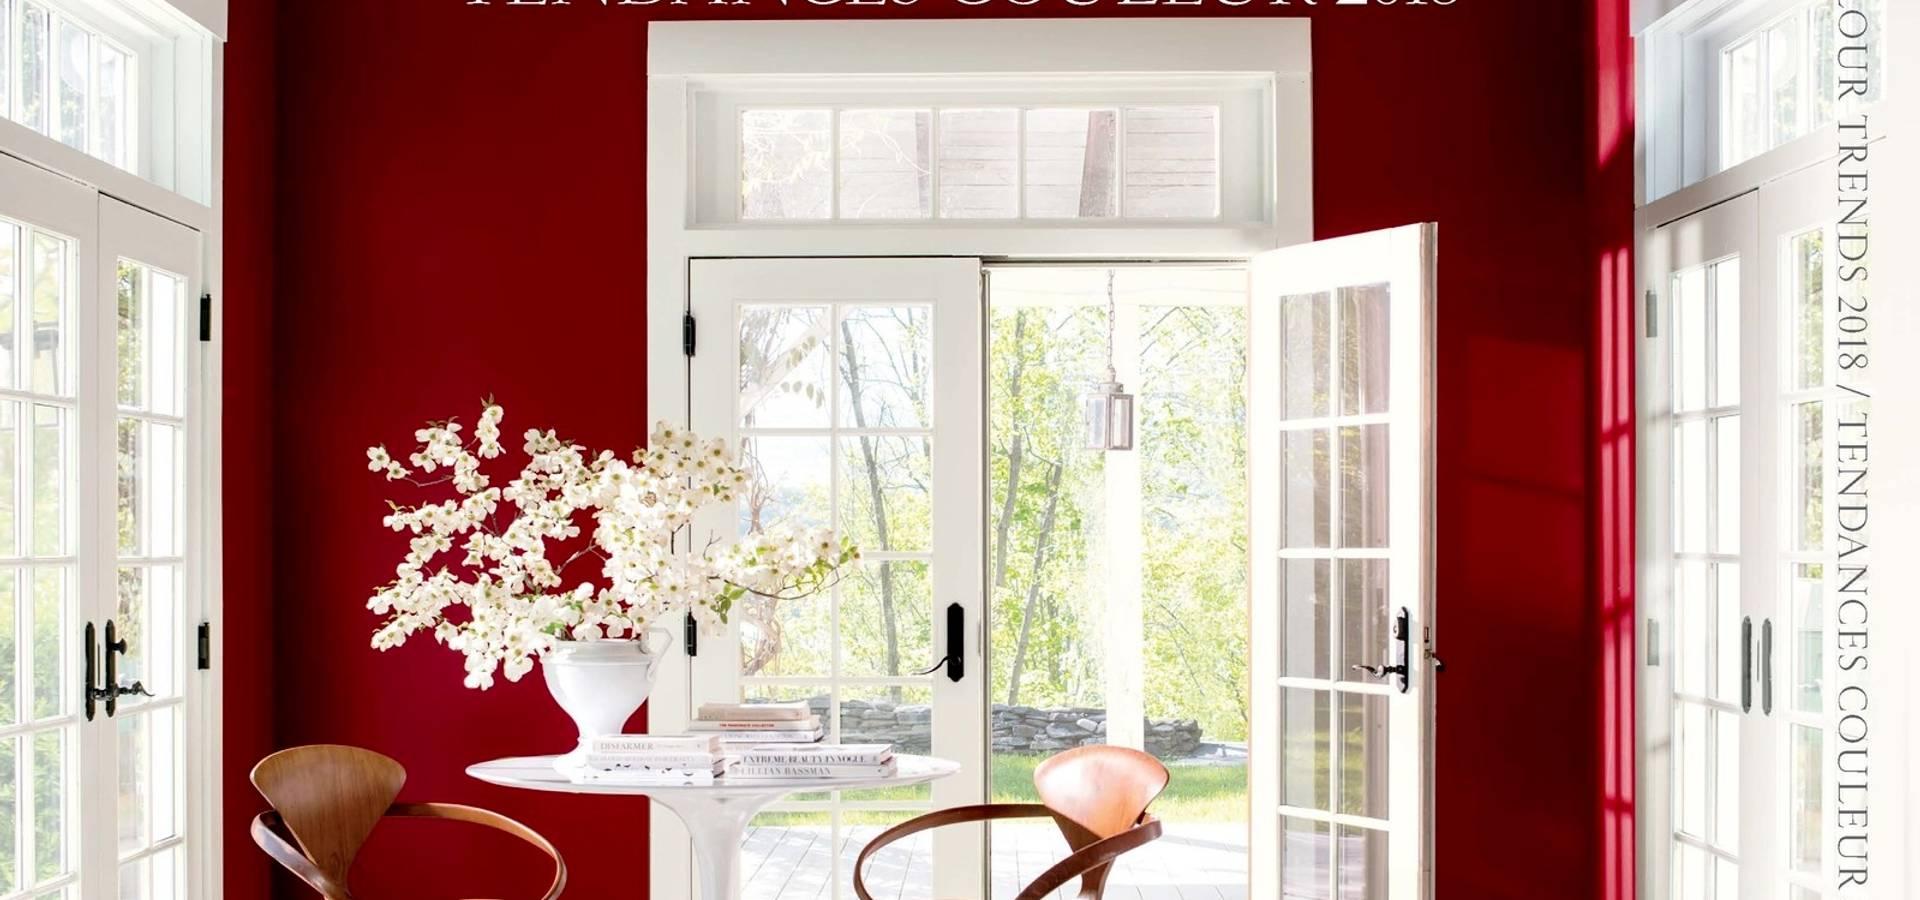 tendances couleur 2018 par benjamin moore france homify. Black Bedroom Furniture Sets. Home Design Ideas